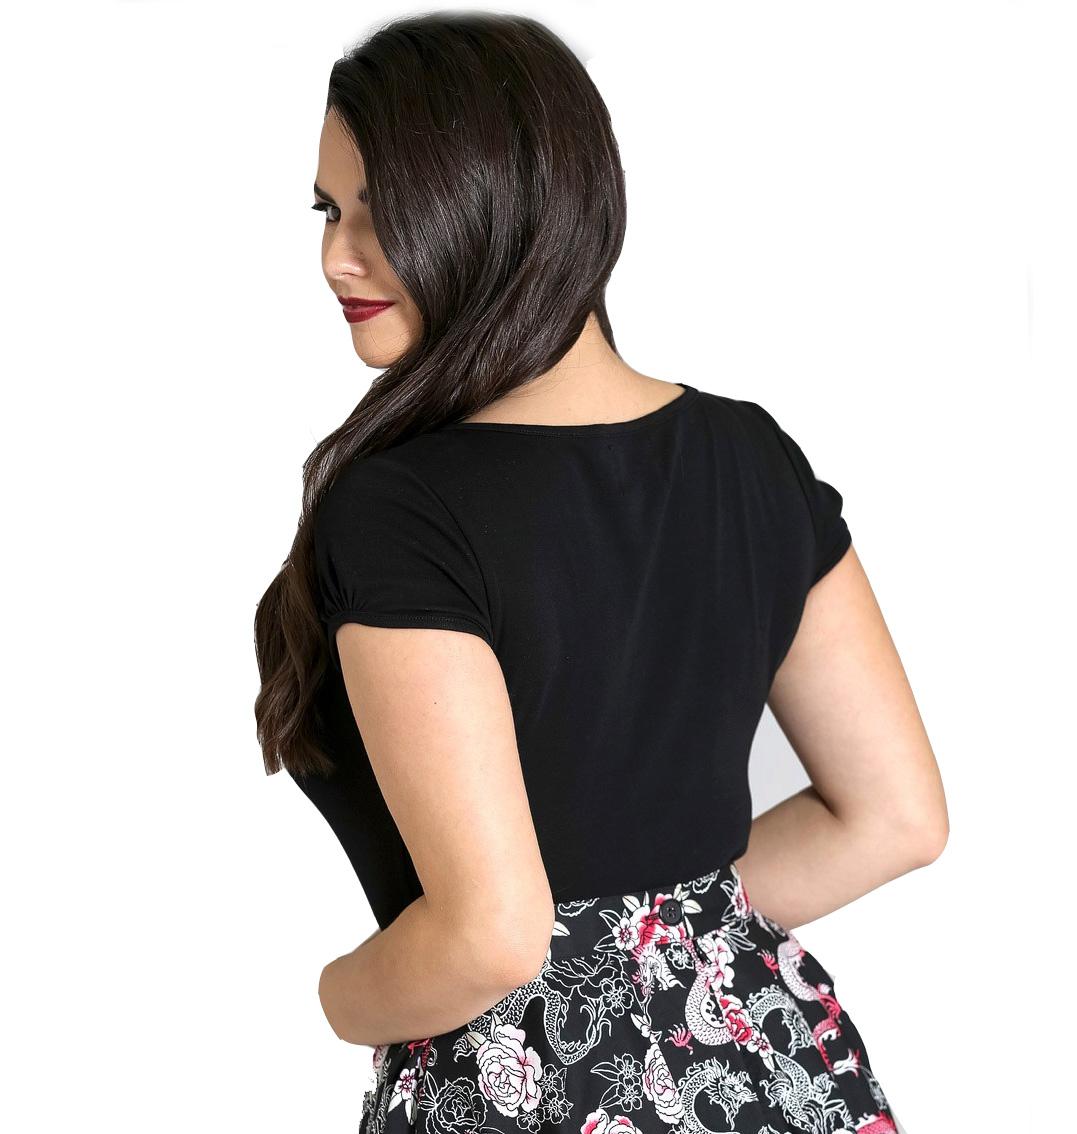 Hell-Bunny-Shirt-50s-Rockabilly-Top-MIA-Plain-Black-Short-Sleeves-All-Sizes thumbnail 17